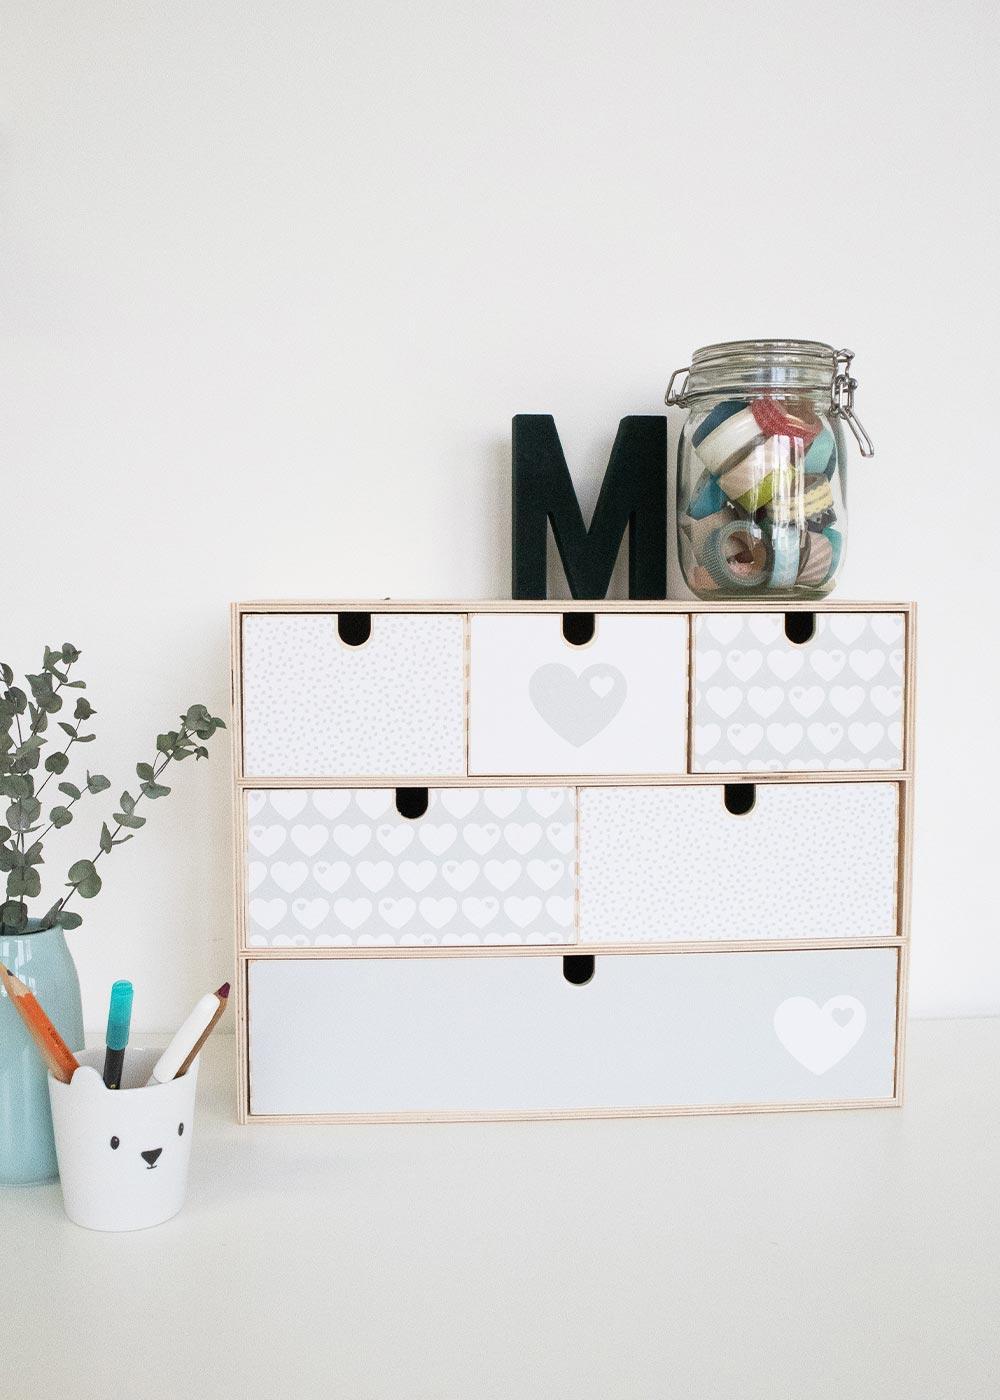 Klebefolie Ikea Moppe ByGraziela grau Herz Beispiel